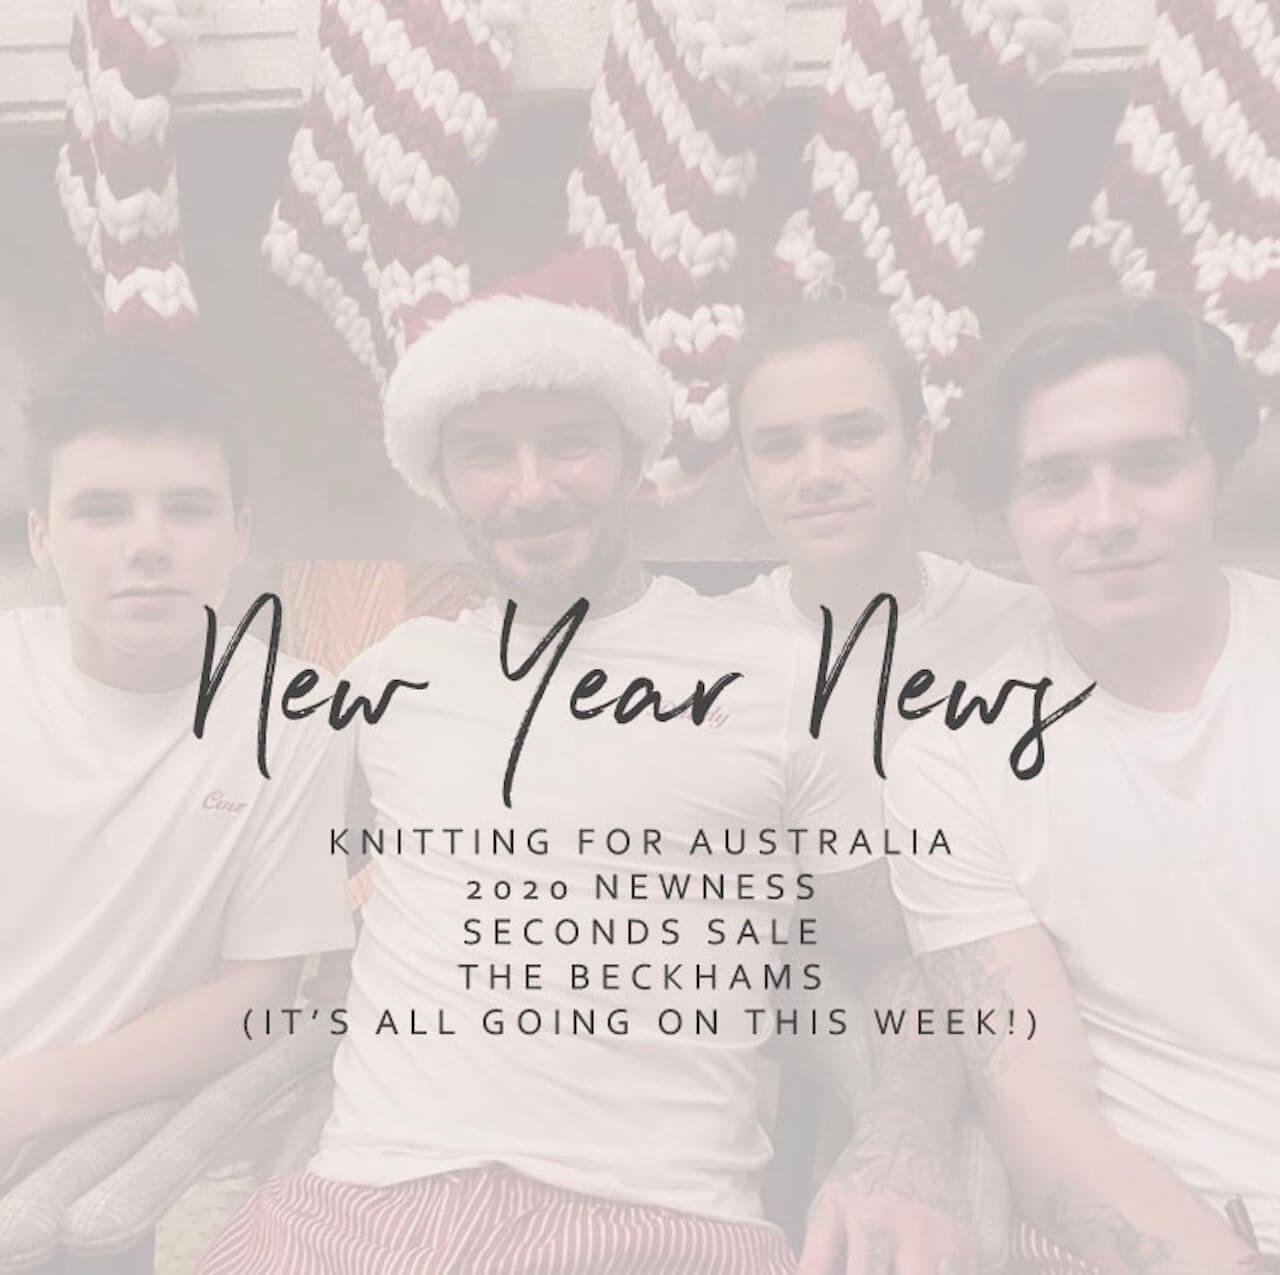 New Year News!